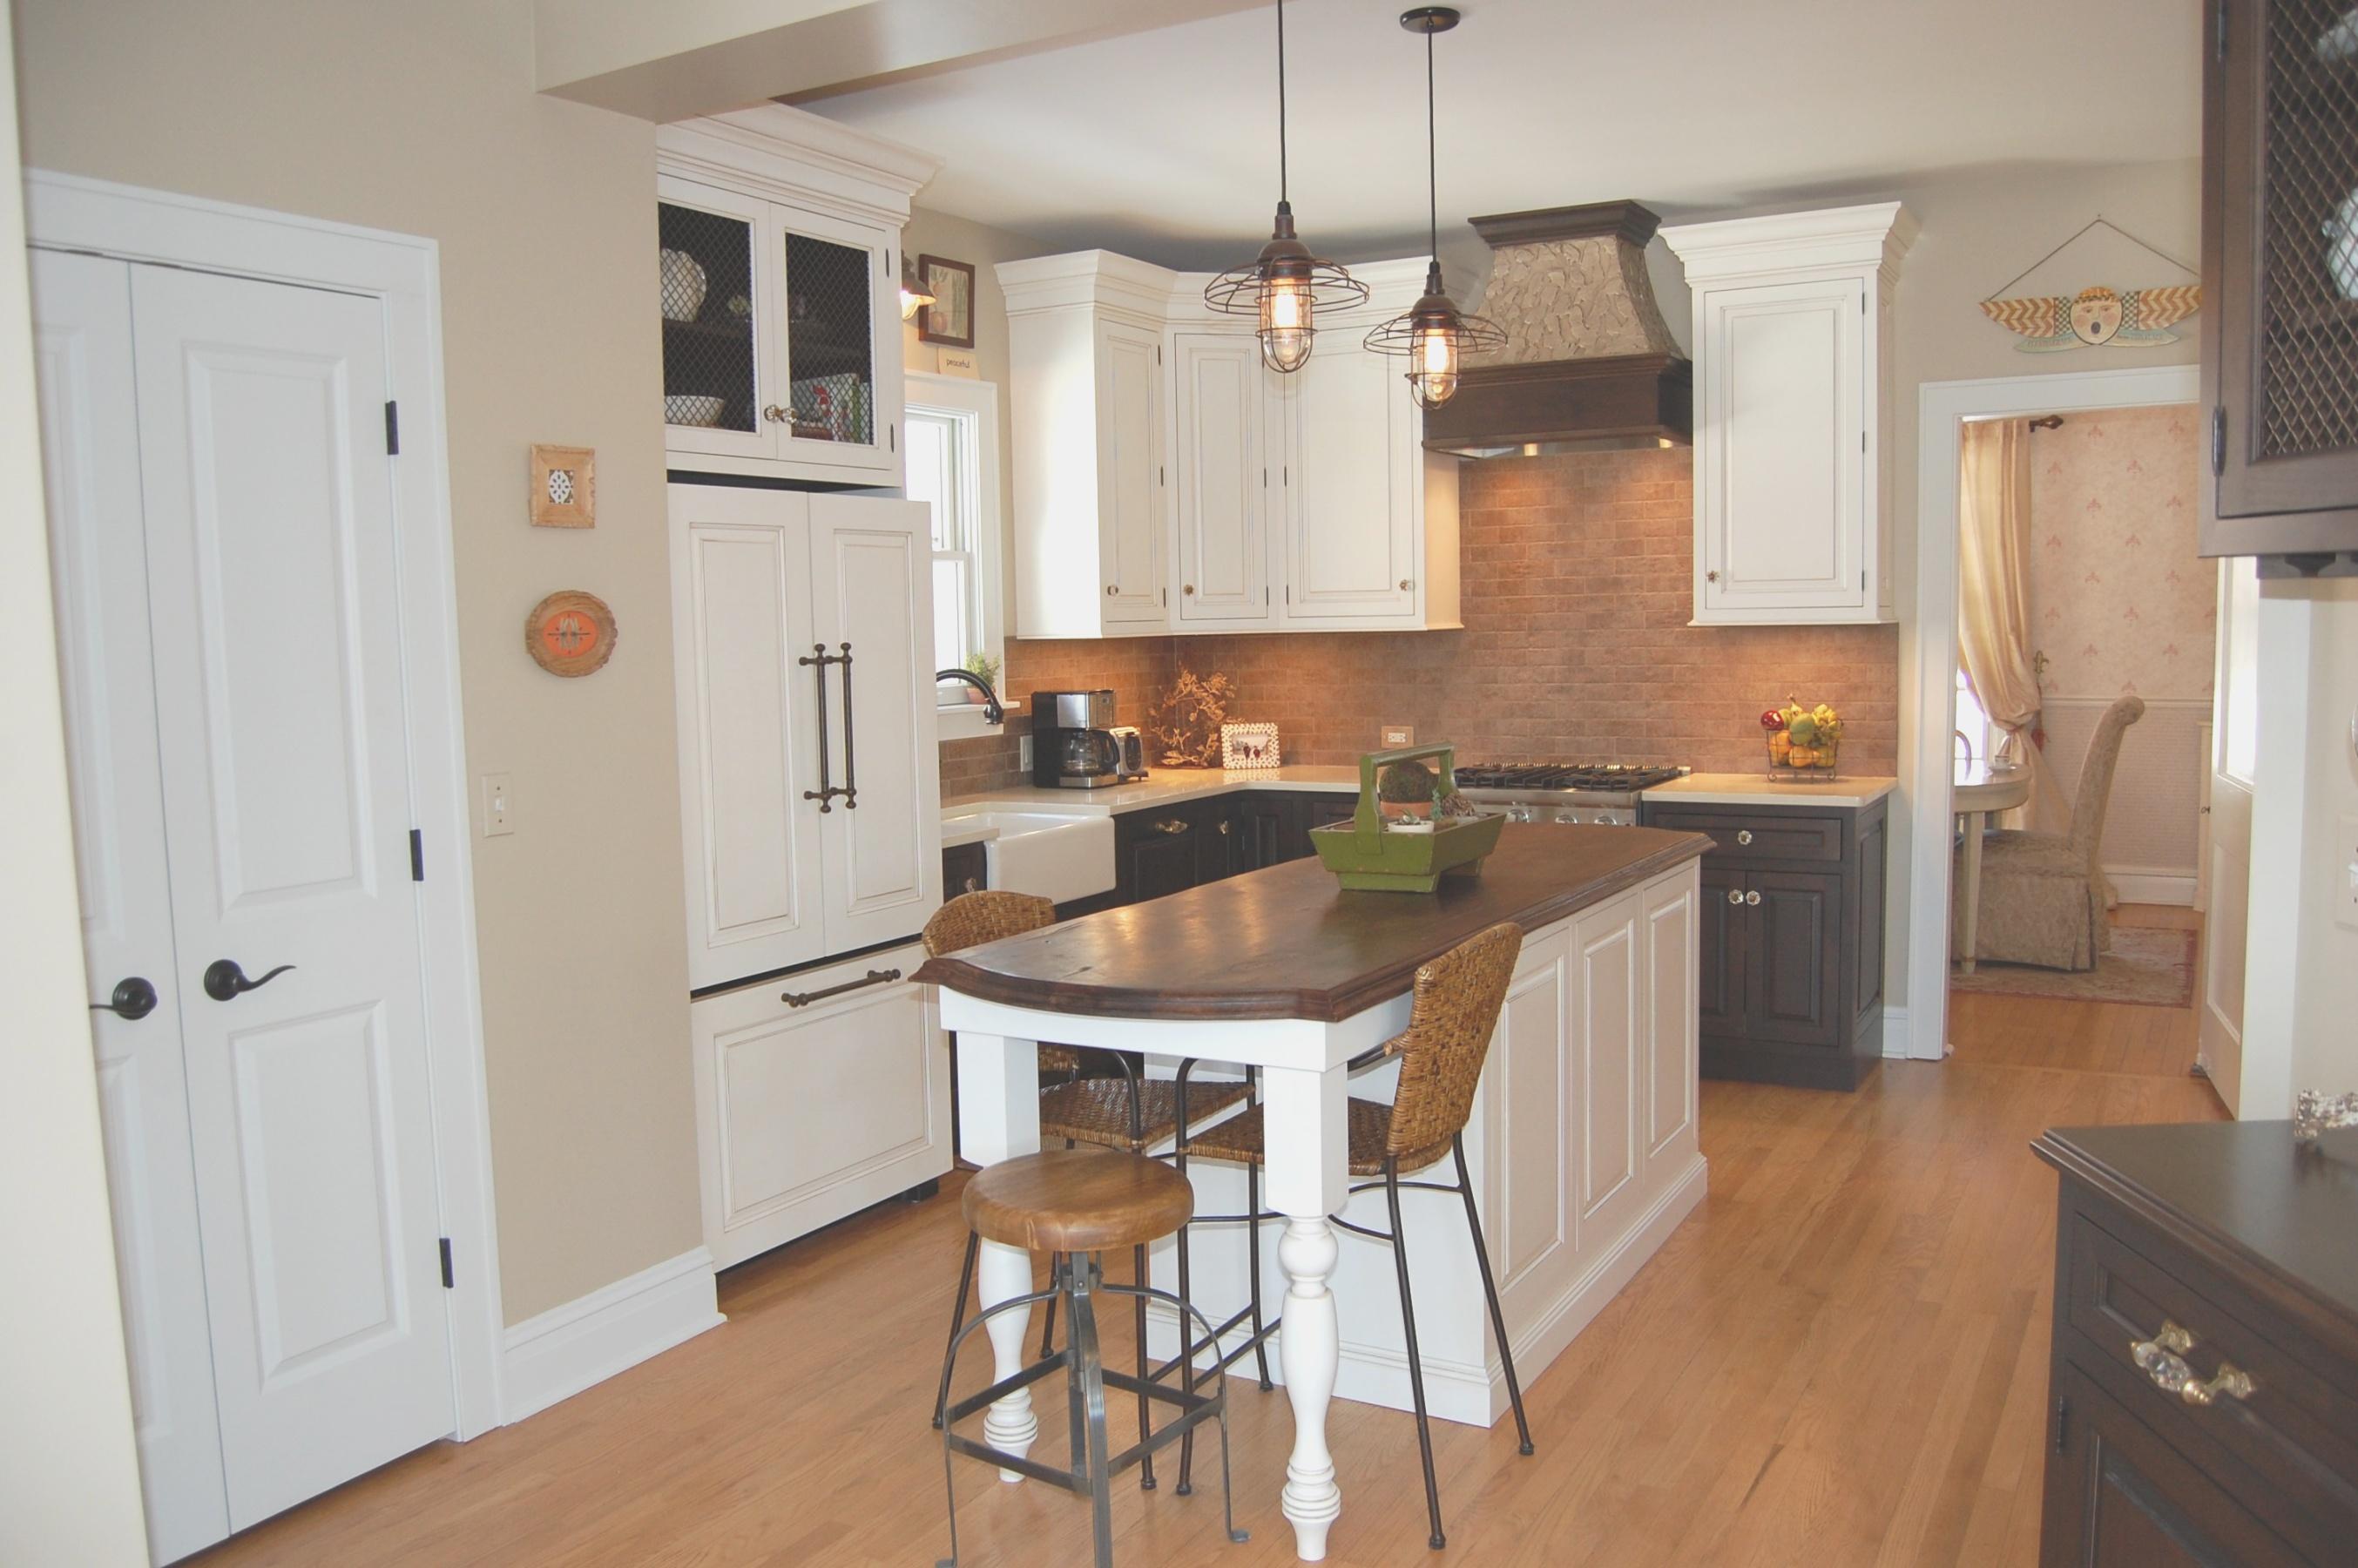 10 advantages of narrow kitchen island ideas | roy home design